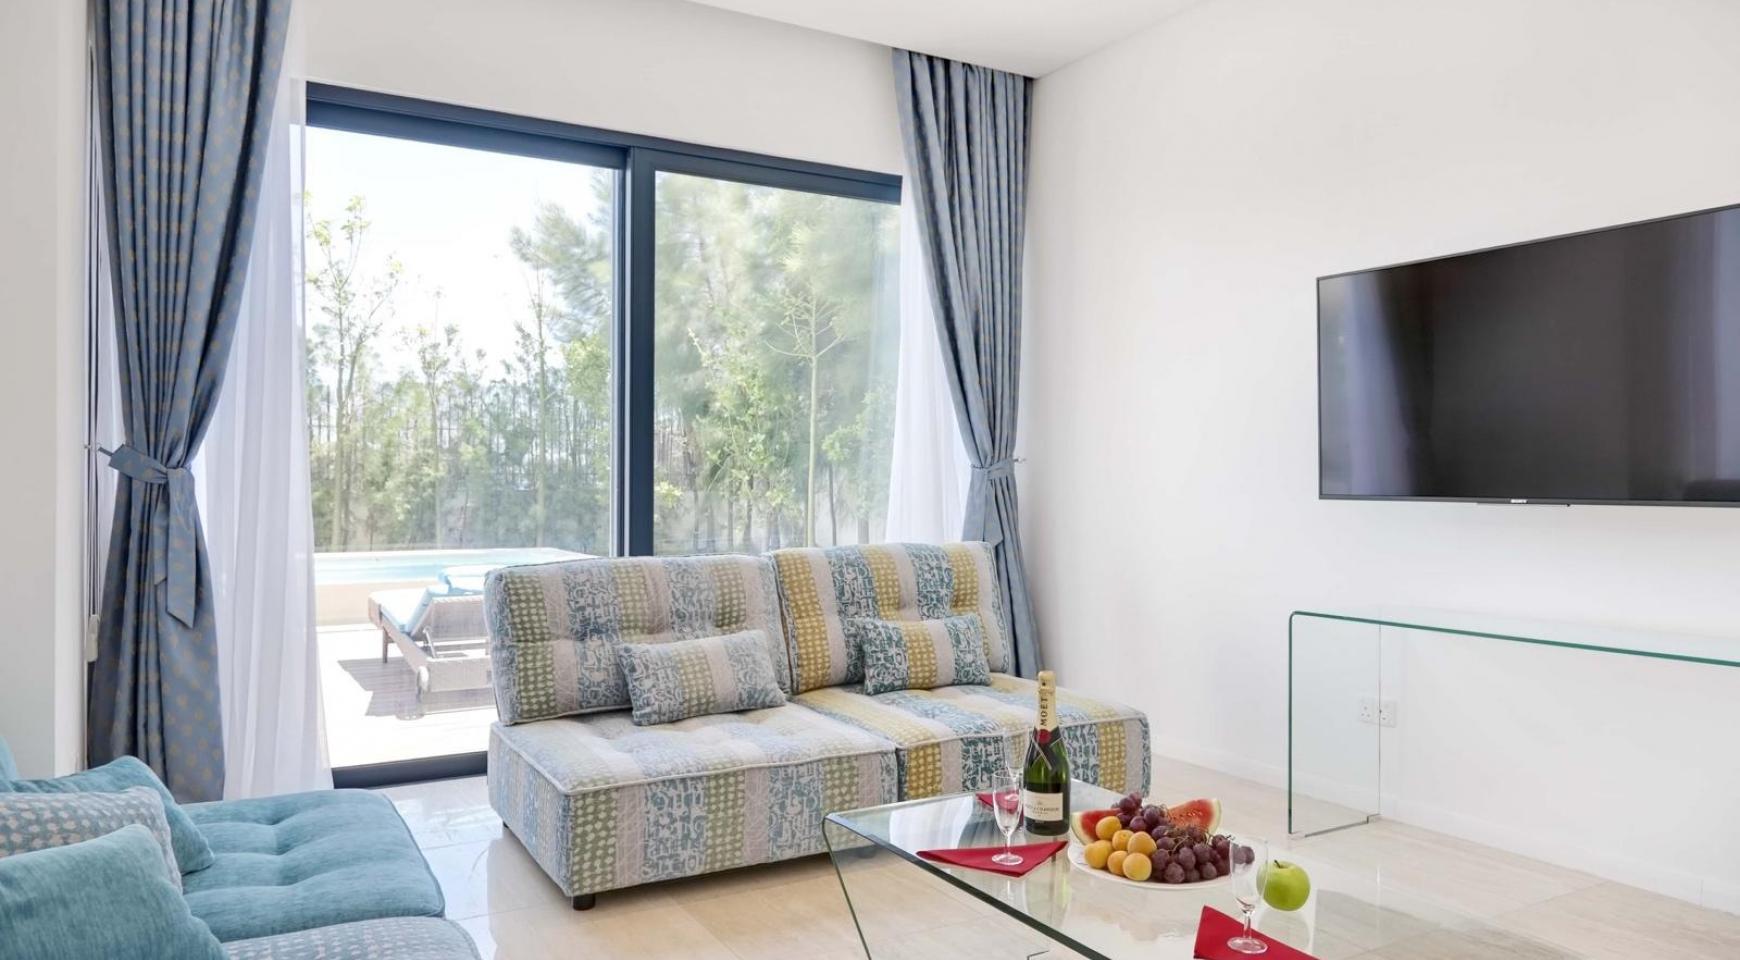 New Luxurious 4 Bedroom Villa in the Tourist Area - 21